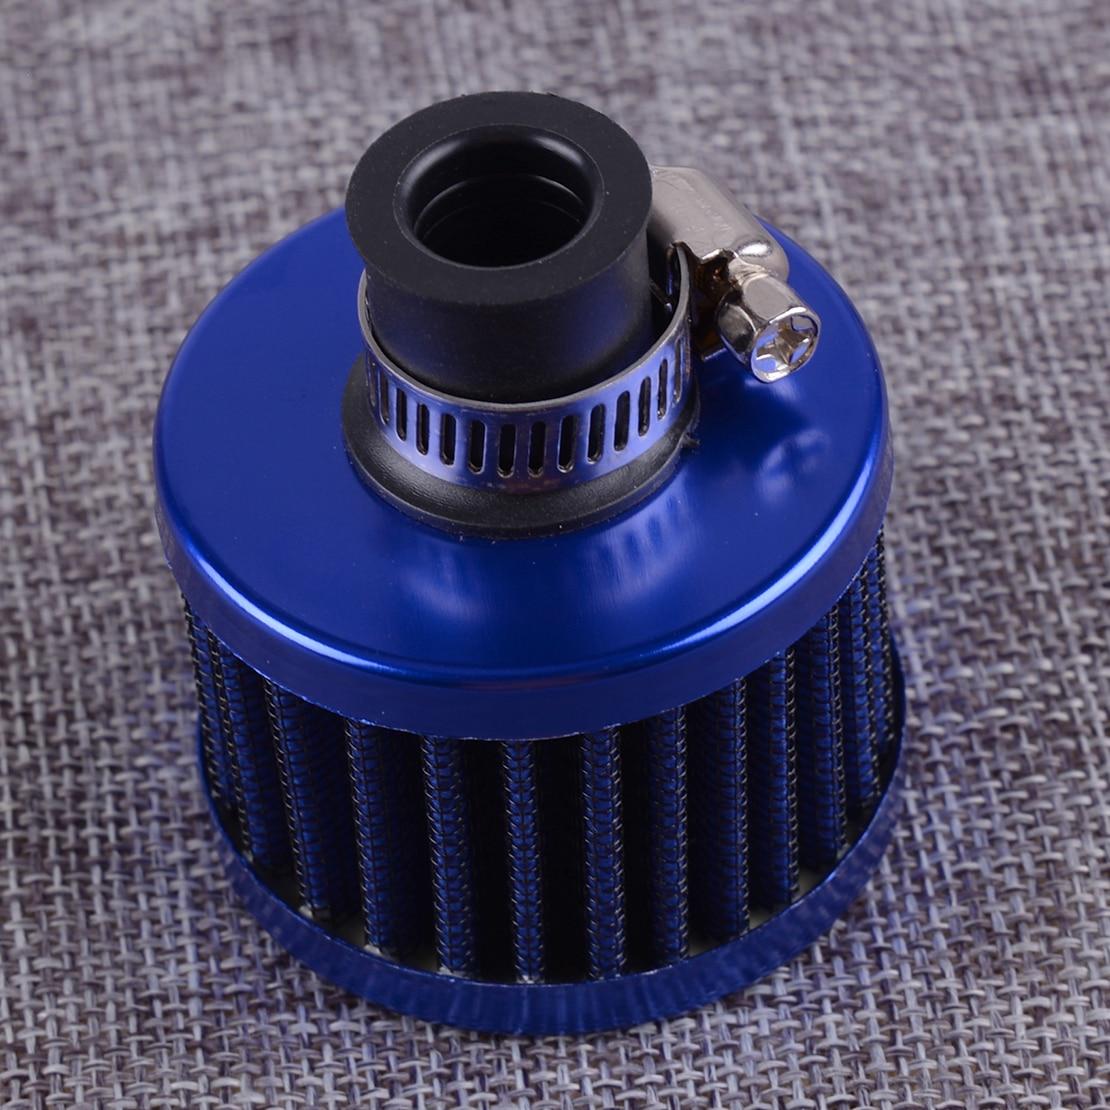 Small Mushroom Head Car Motor Cold Air Intake Filter Turbo Vent Crank Breather d